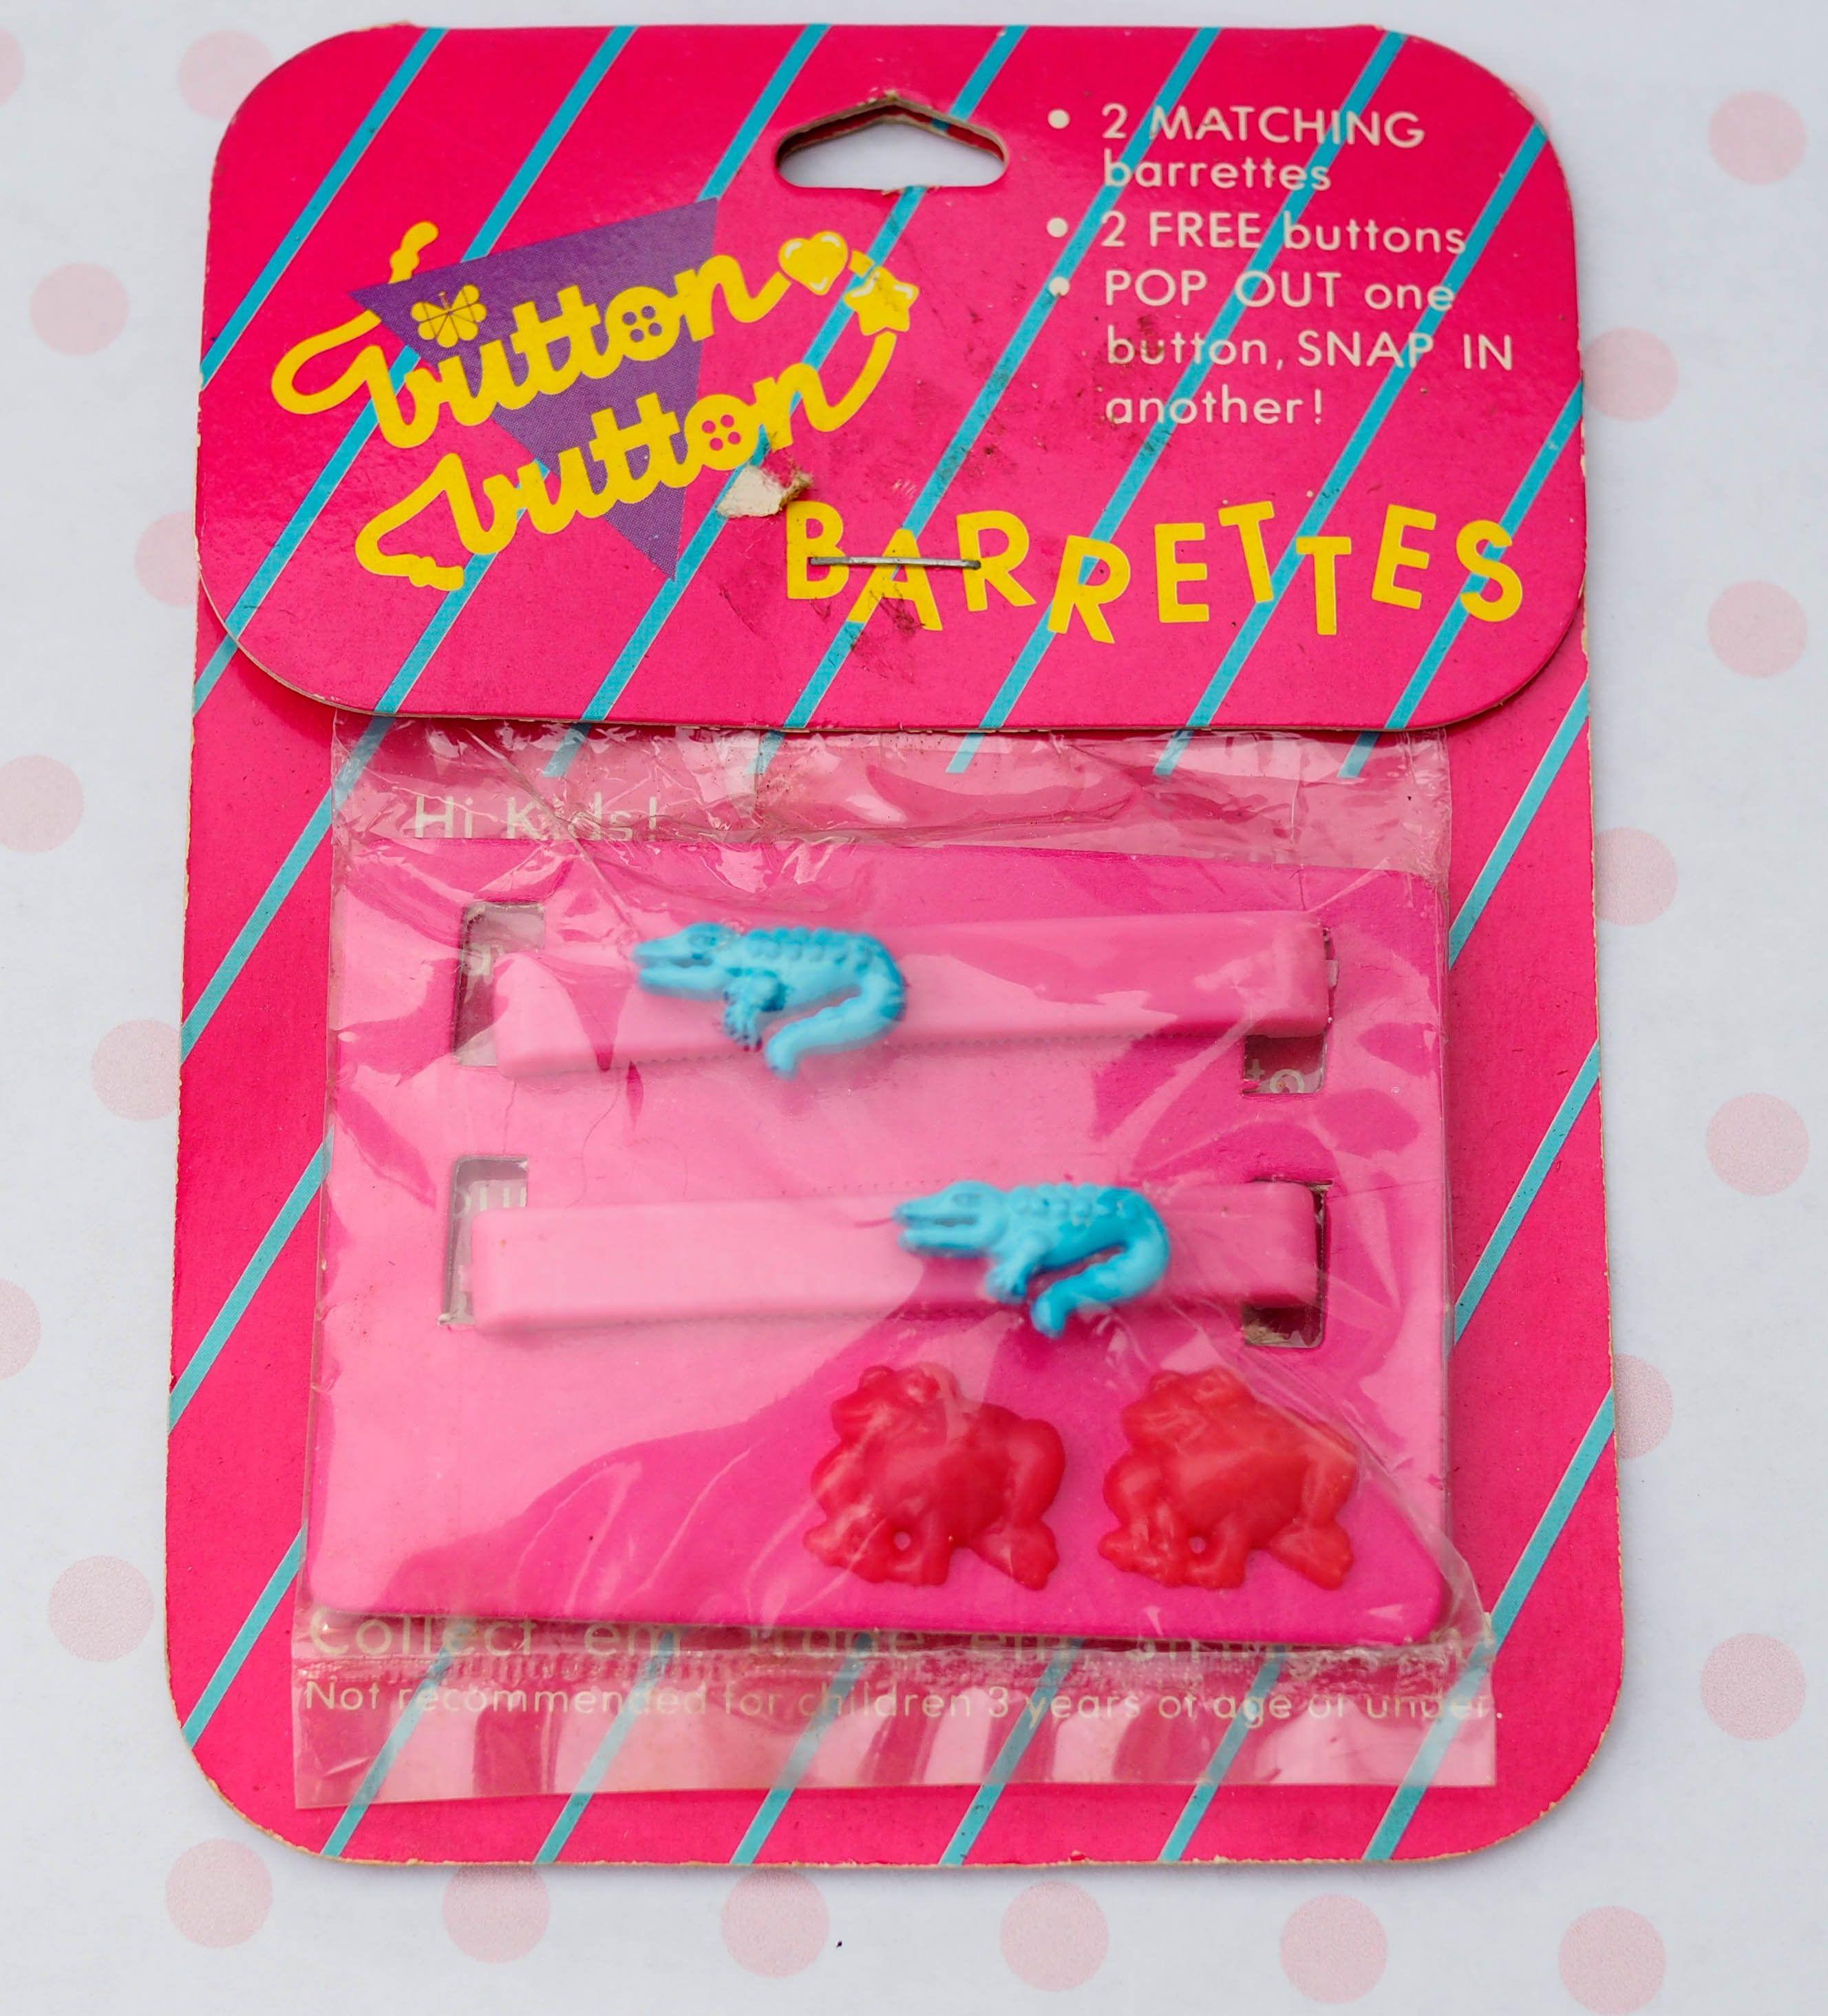 Vintage Plastic Barrettes 80s Barrettes Crocodile Frog Barrettes Vintage Hair Pin Hair Clip Bobby Pin Vintage Je Pink Barrettes Vintage Jewelry Barrettes